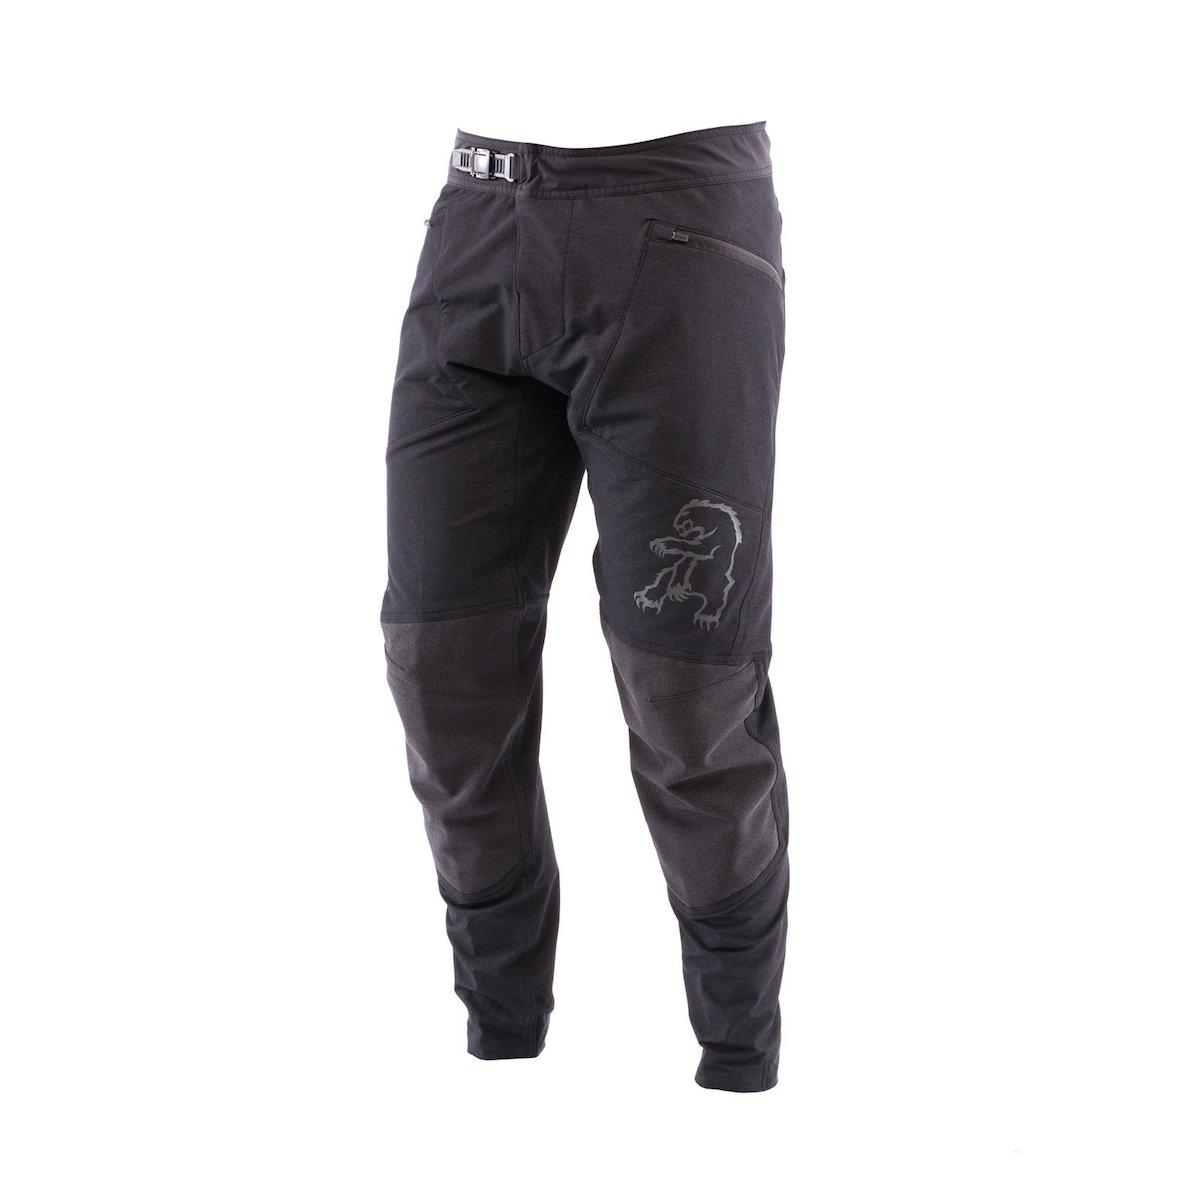 Pantaloni Feint Dark Charcoal